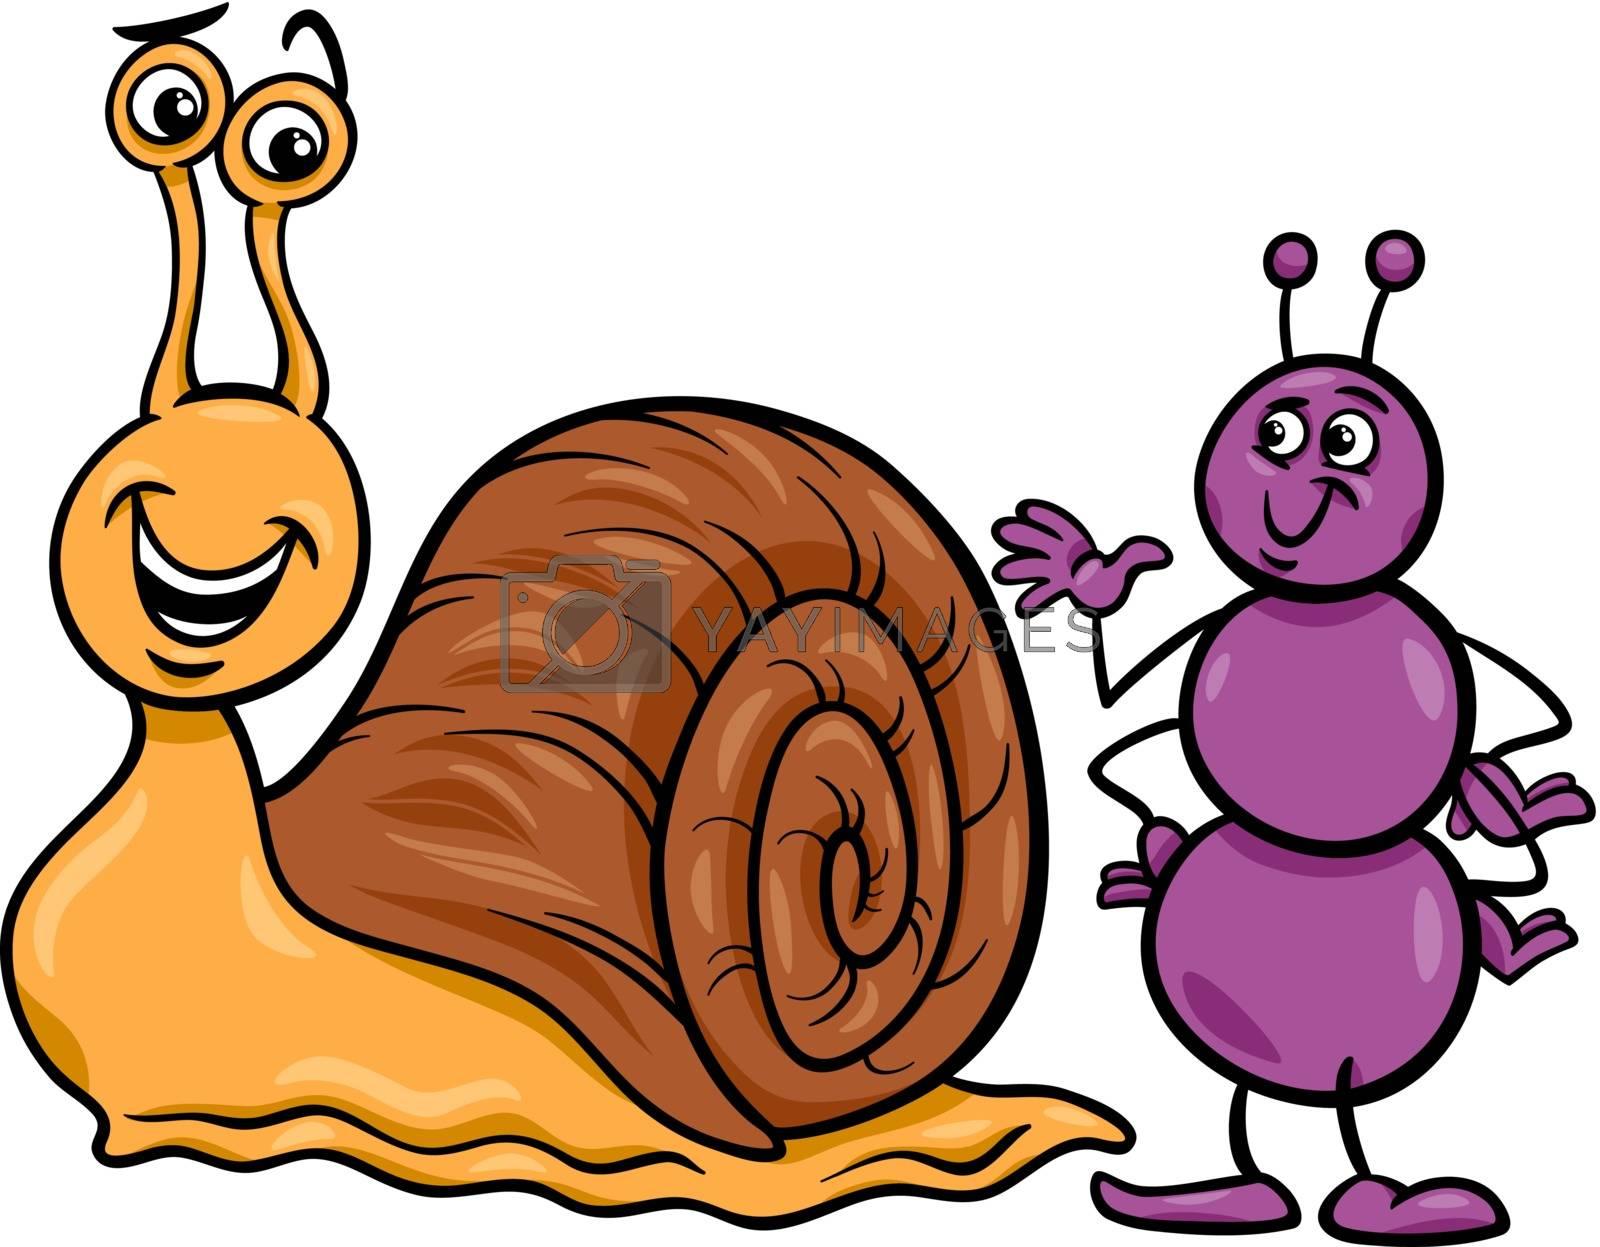 Royalty free image of ant and snail cartoon illustration by izakowski